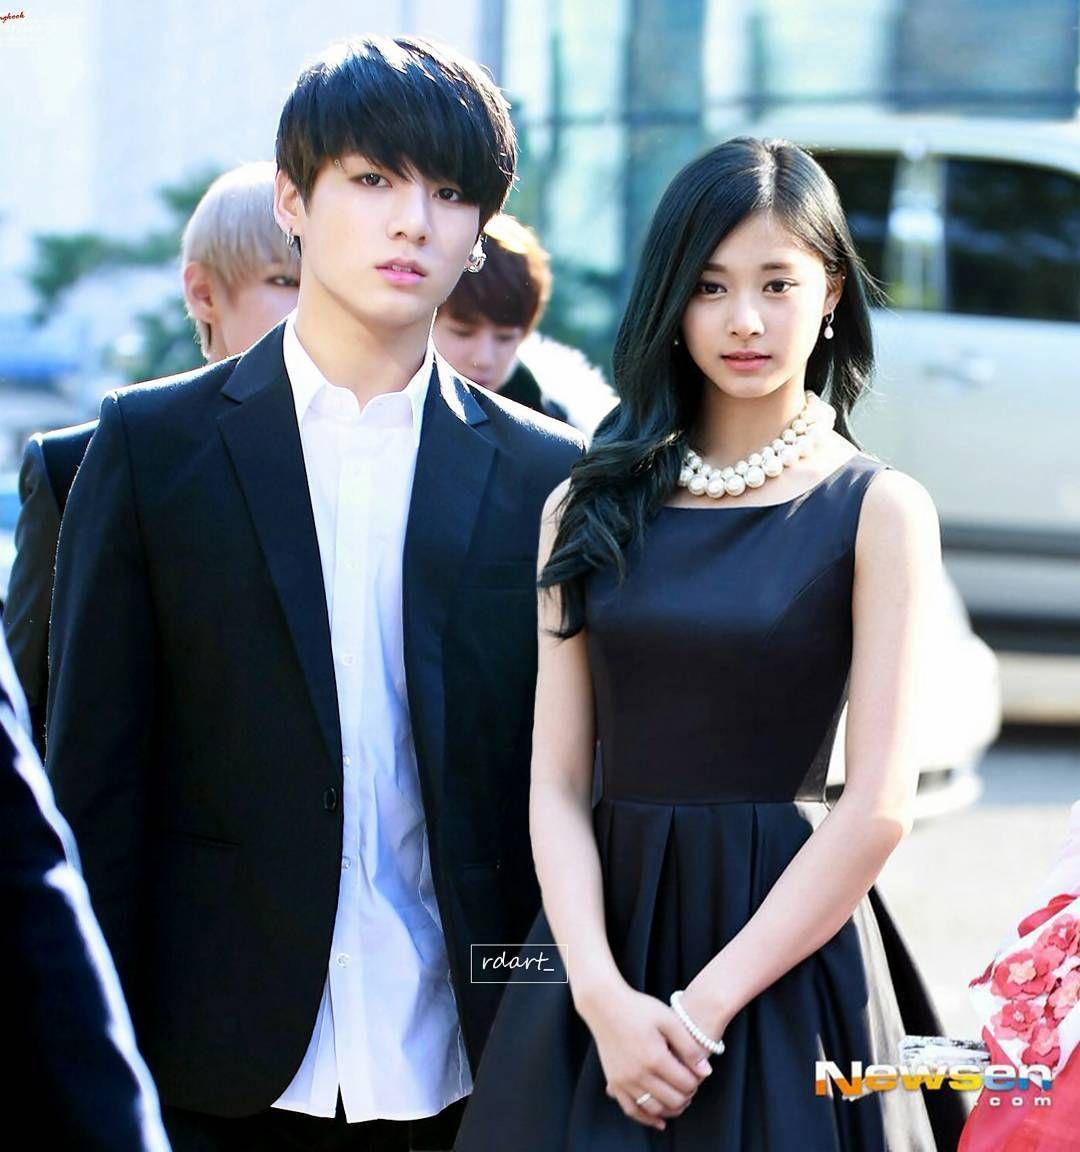 Jungkook dating black girl